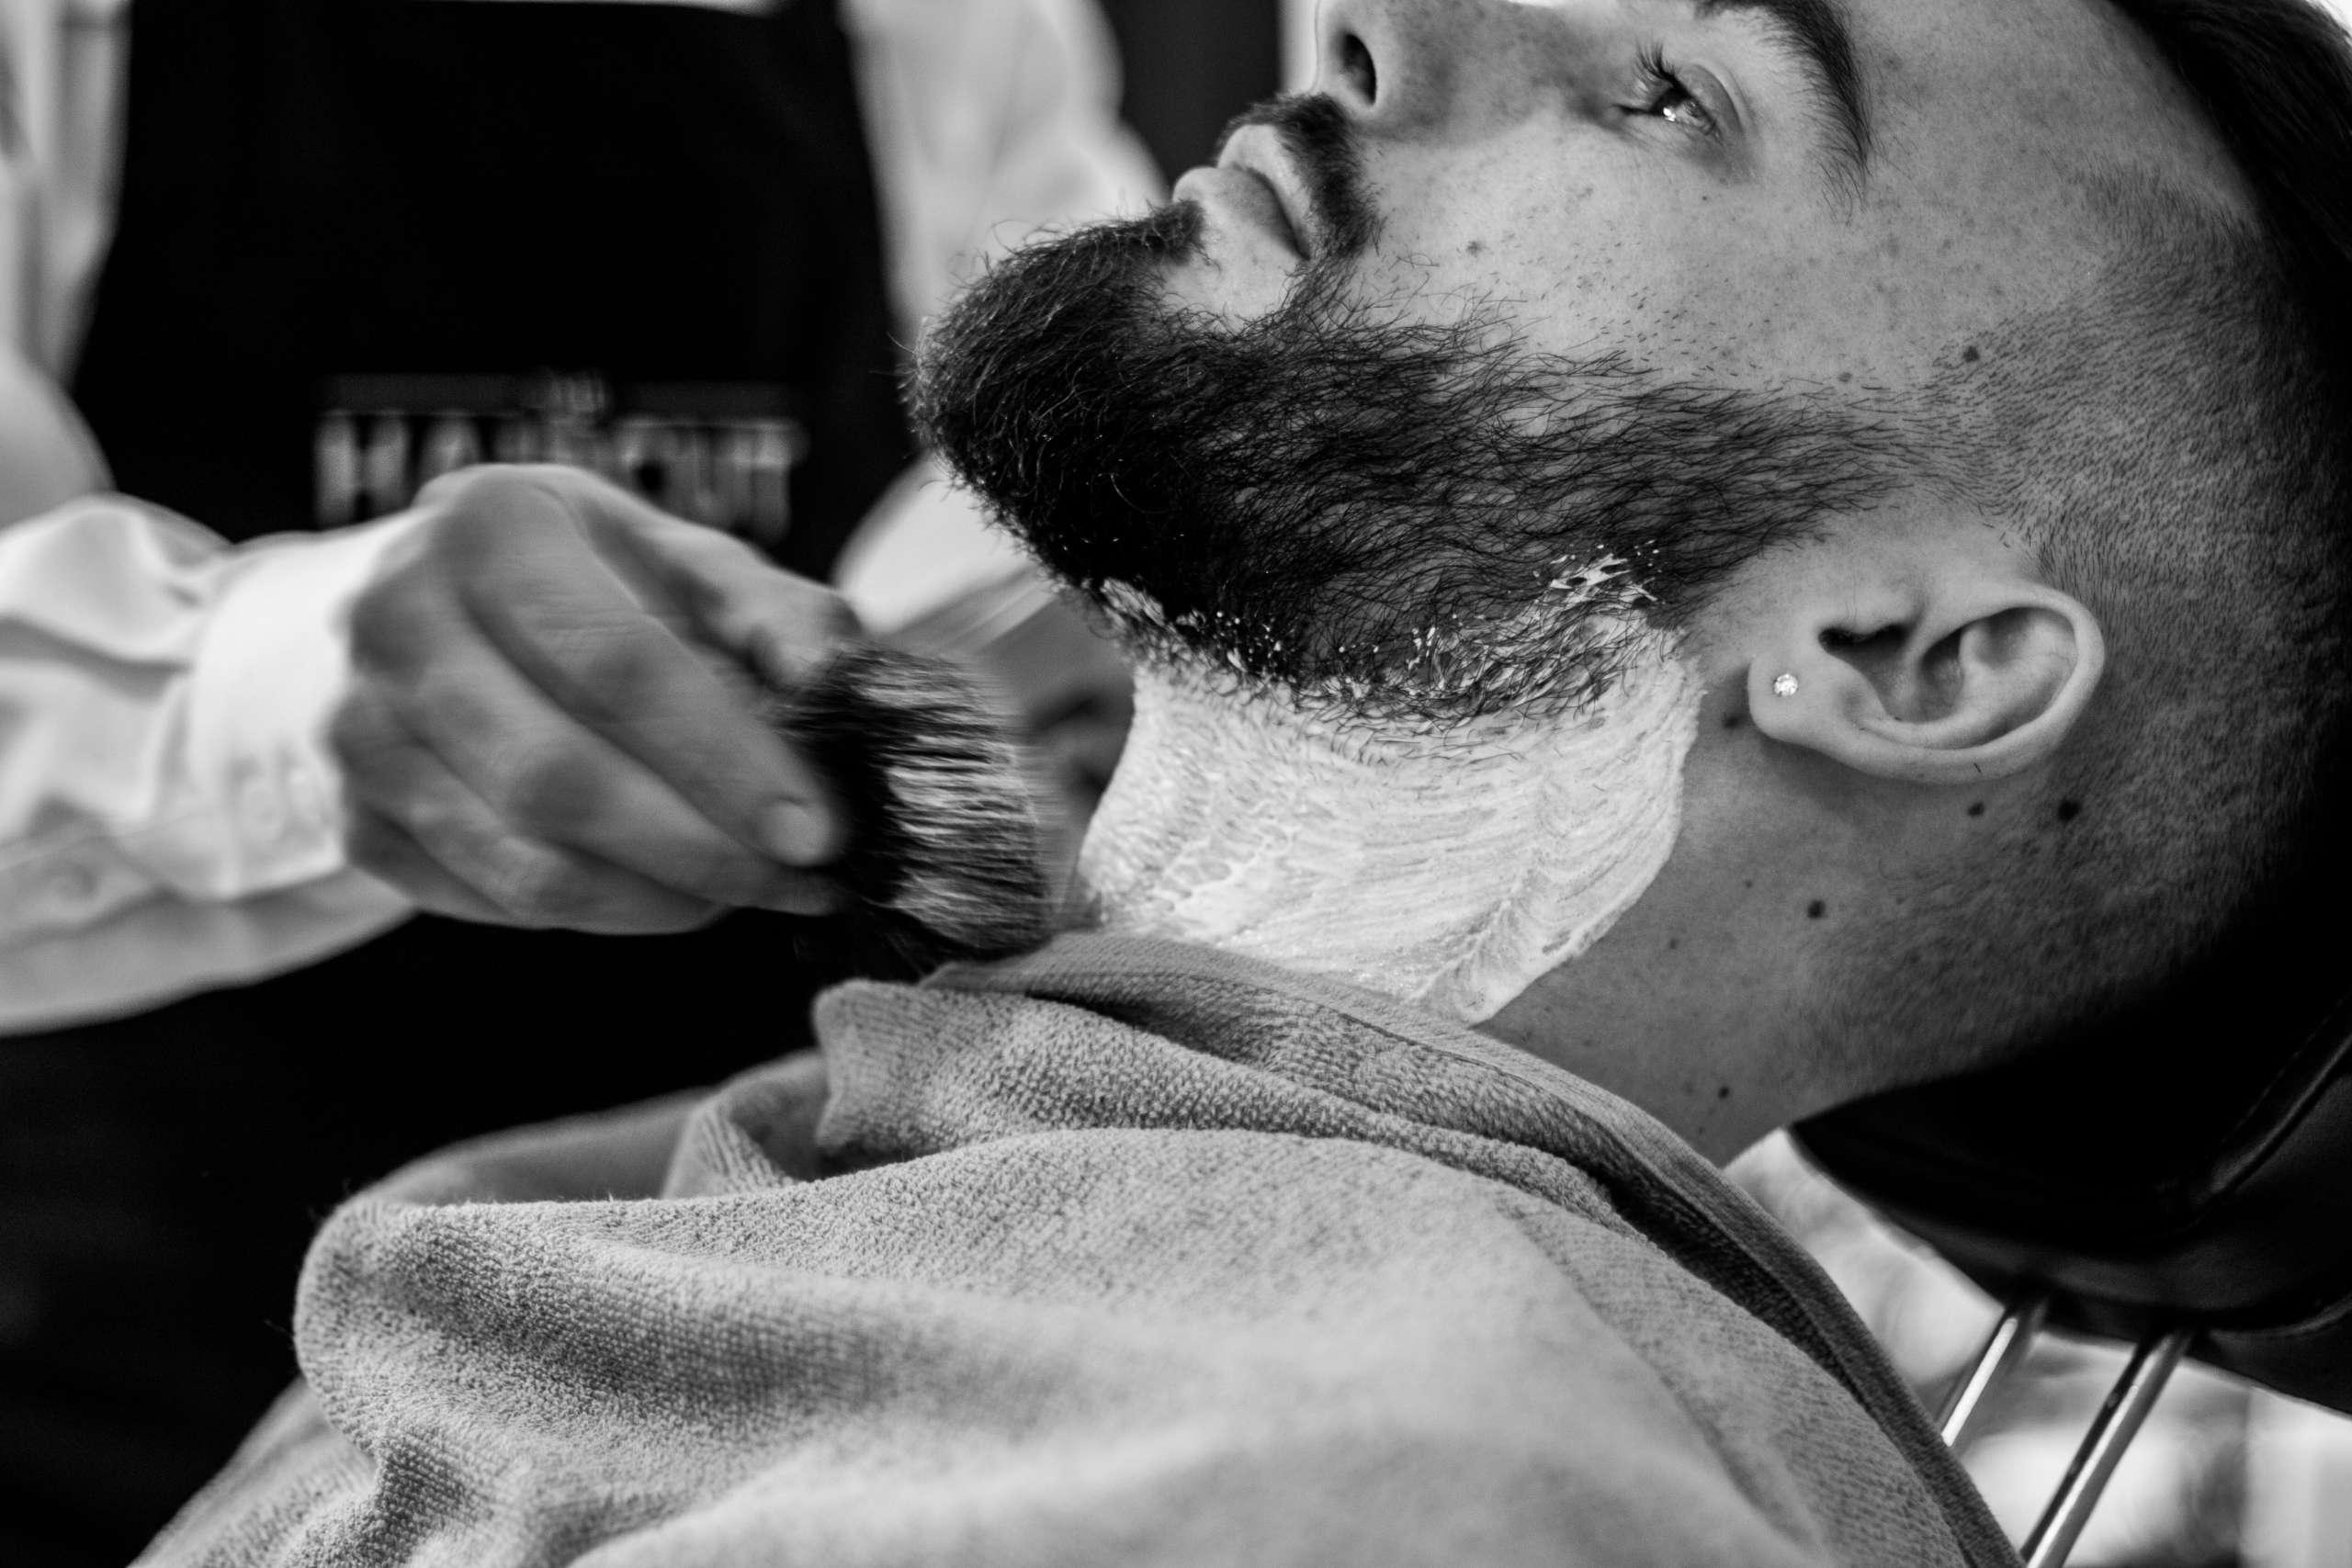 man shaving at barber